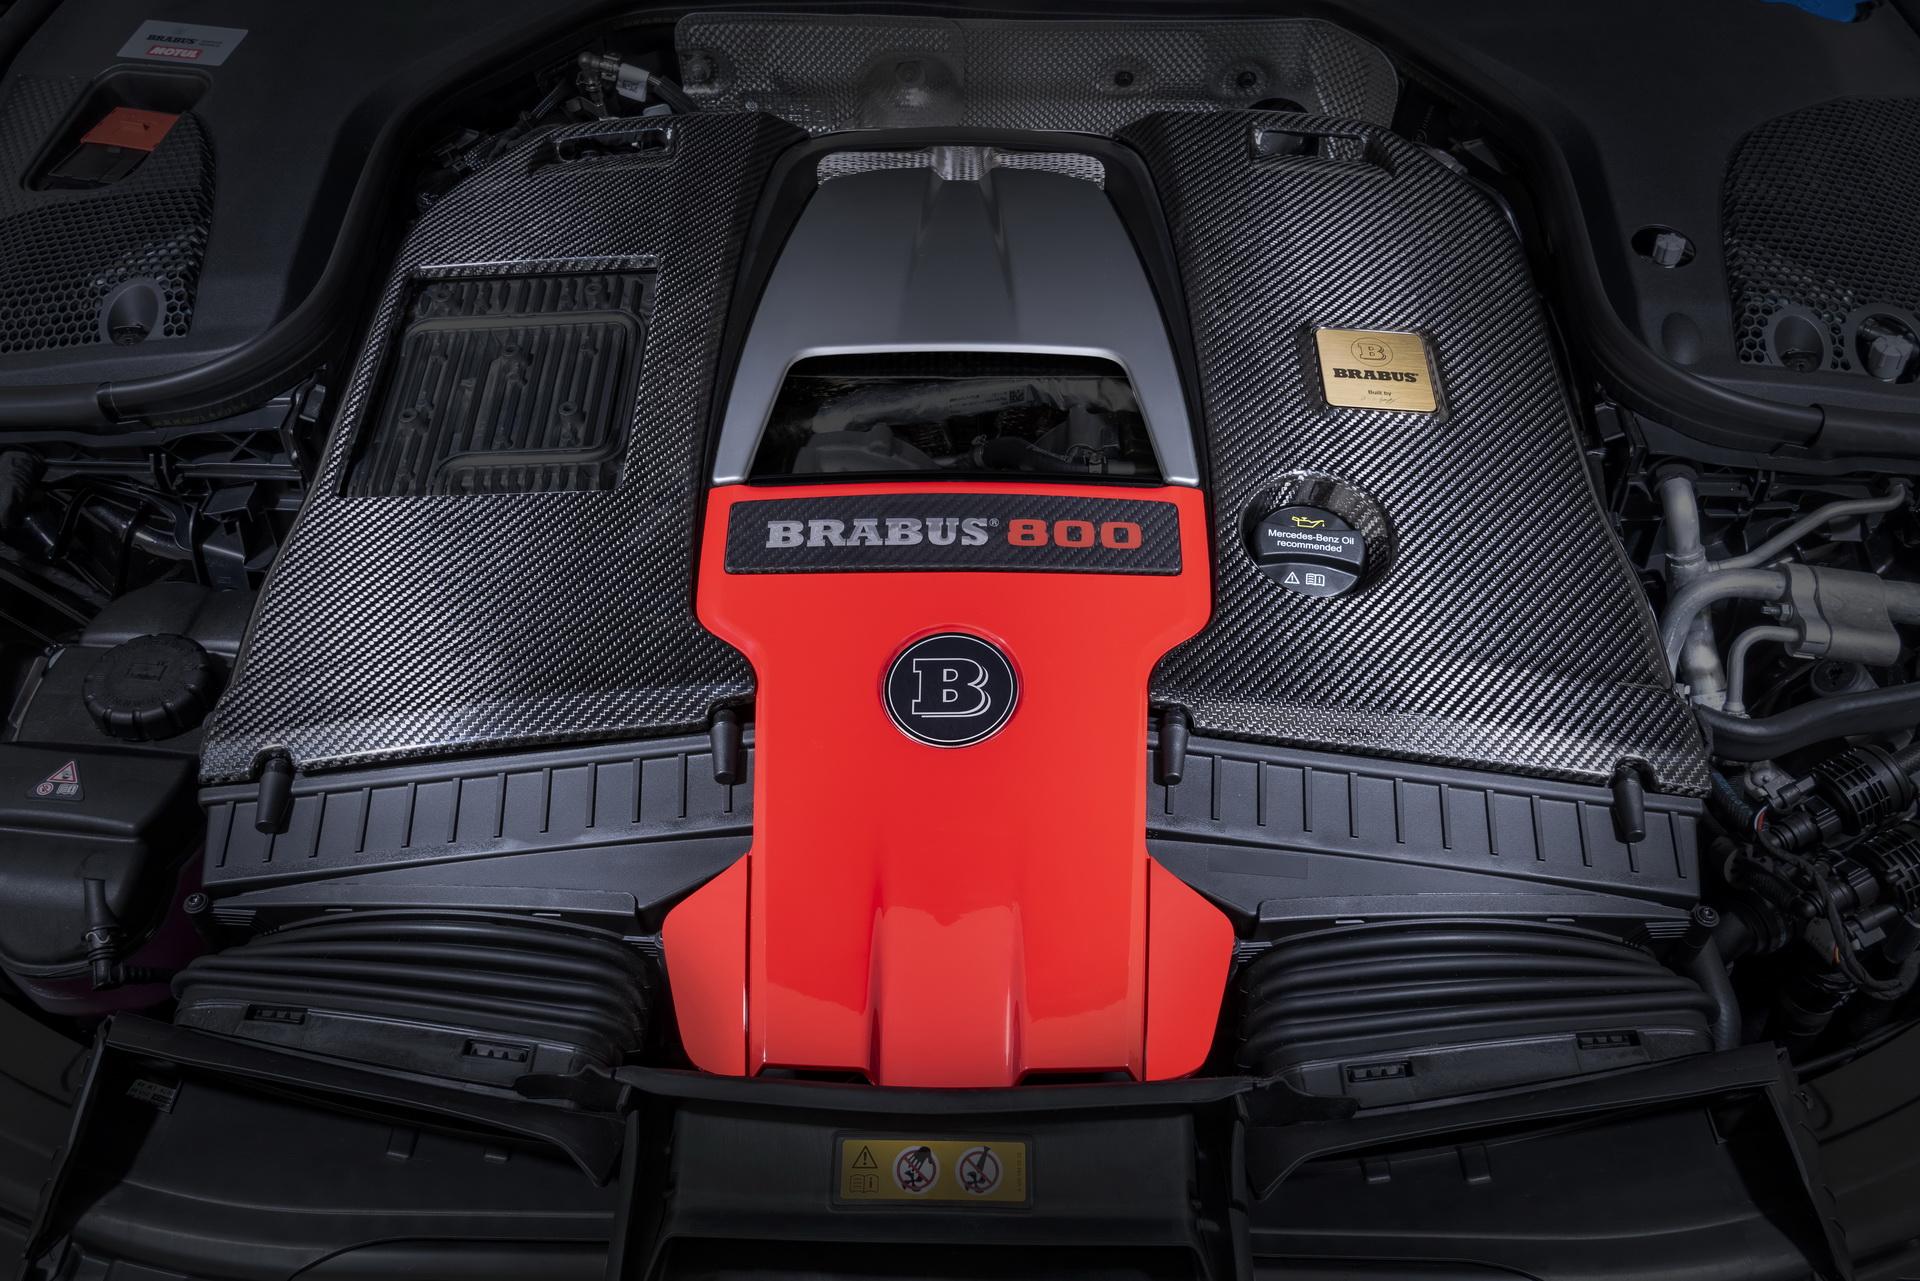 Brabus GT63 S AMG Engine